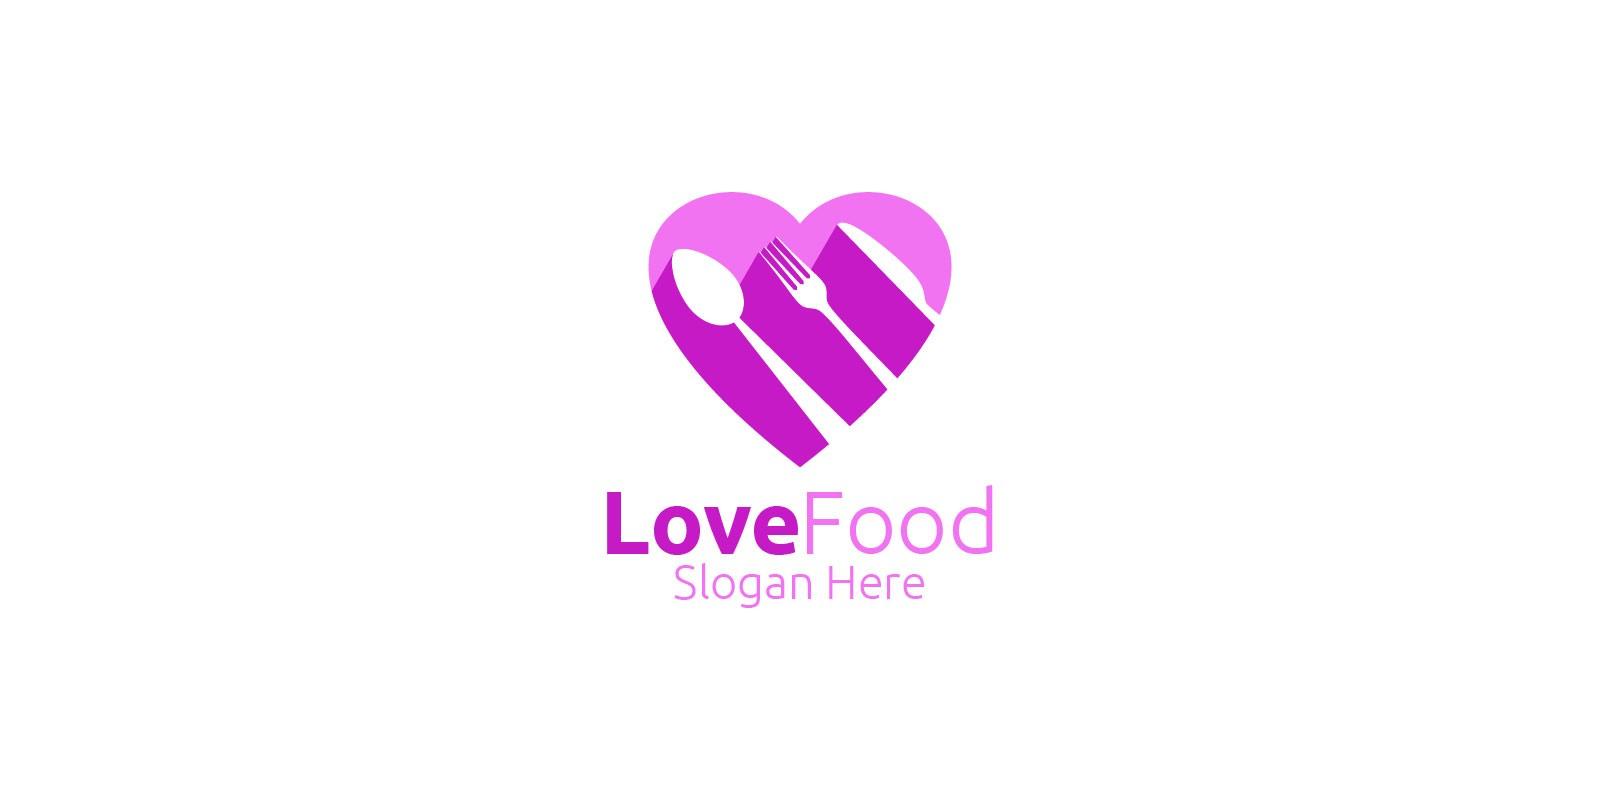 Love Healthy Food Logo  for Restaurant or  Cafe